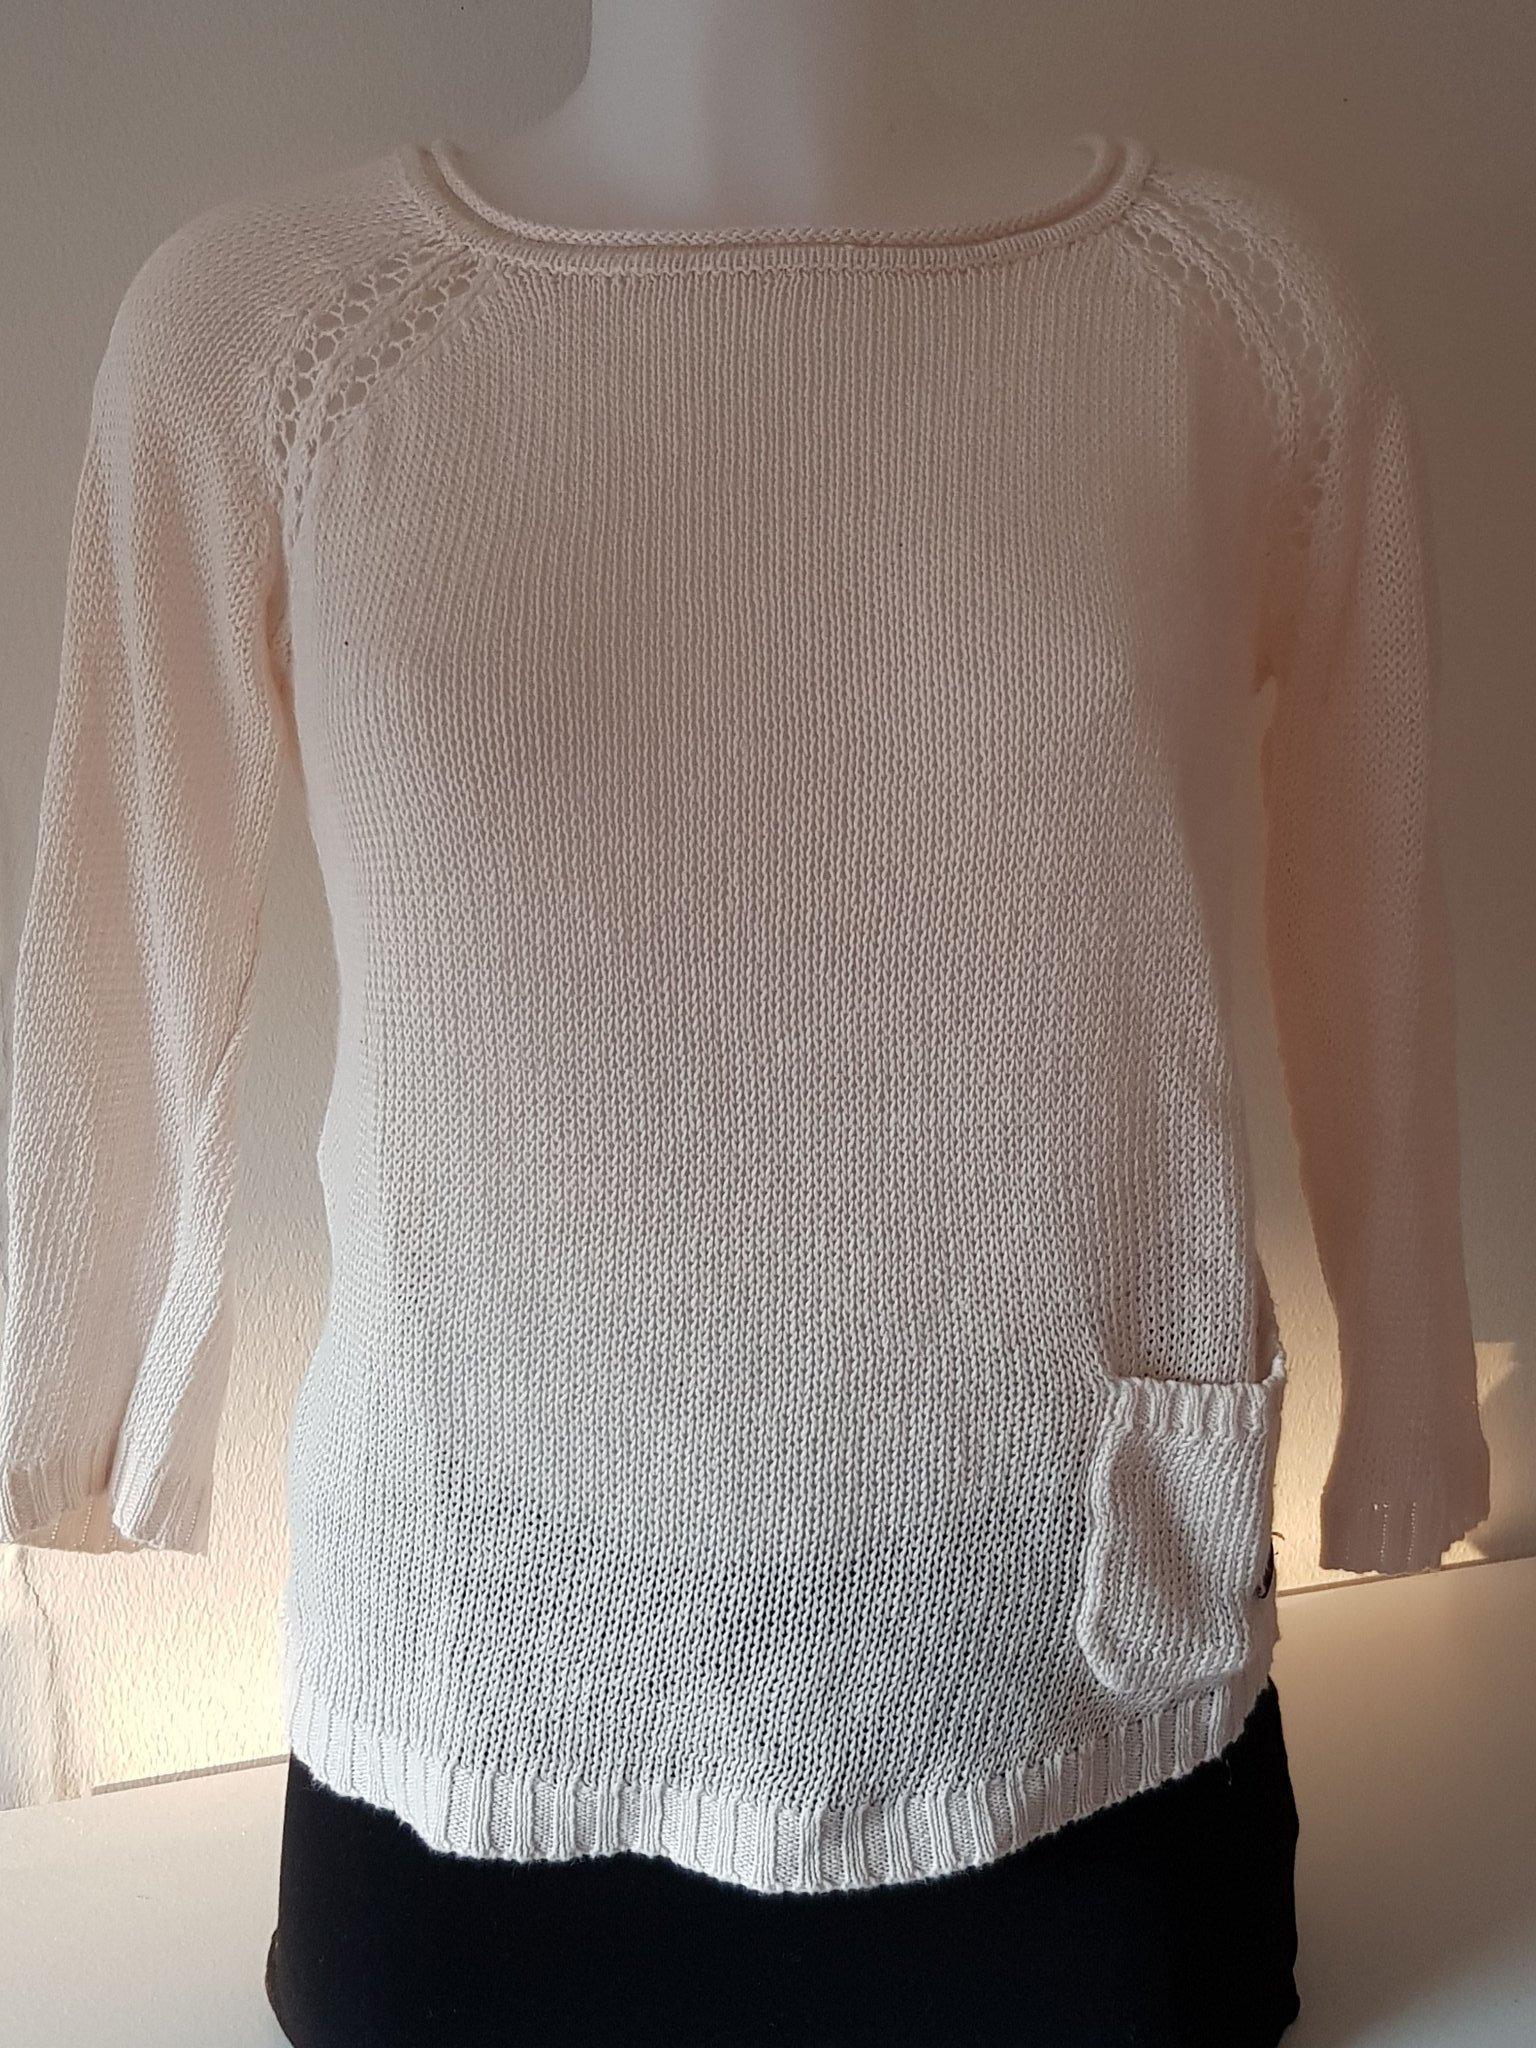 Dobber Stickad tröja cremevit 100% Linne stl. X.. (377622339